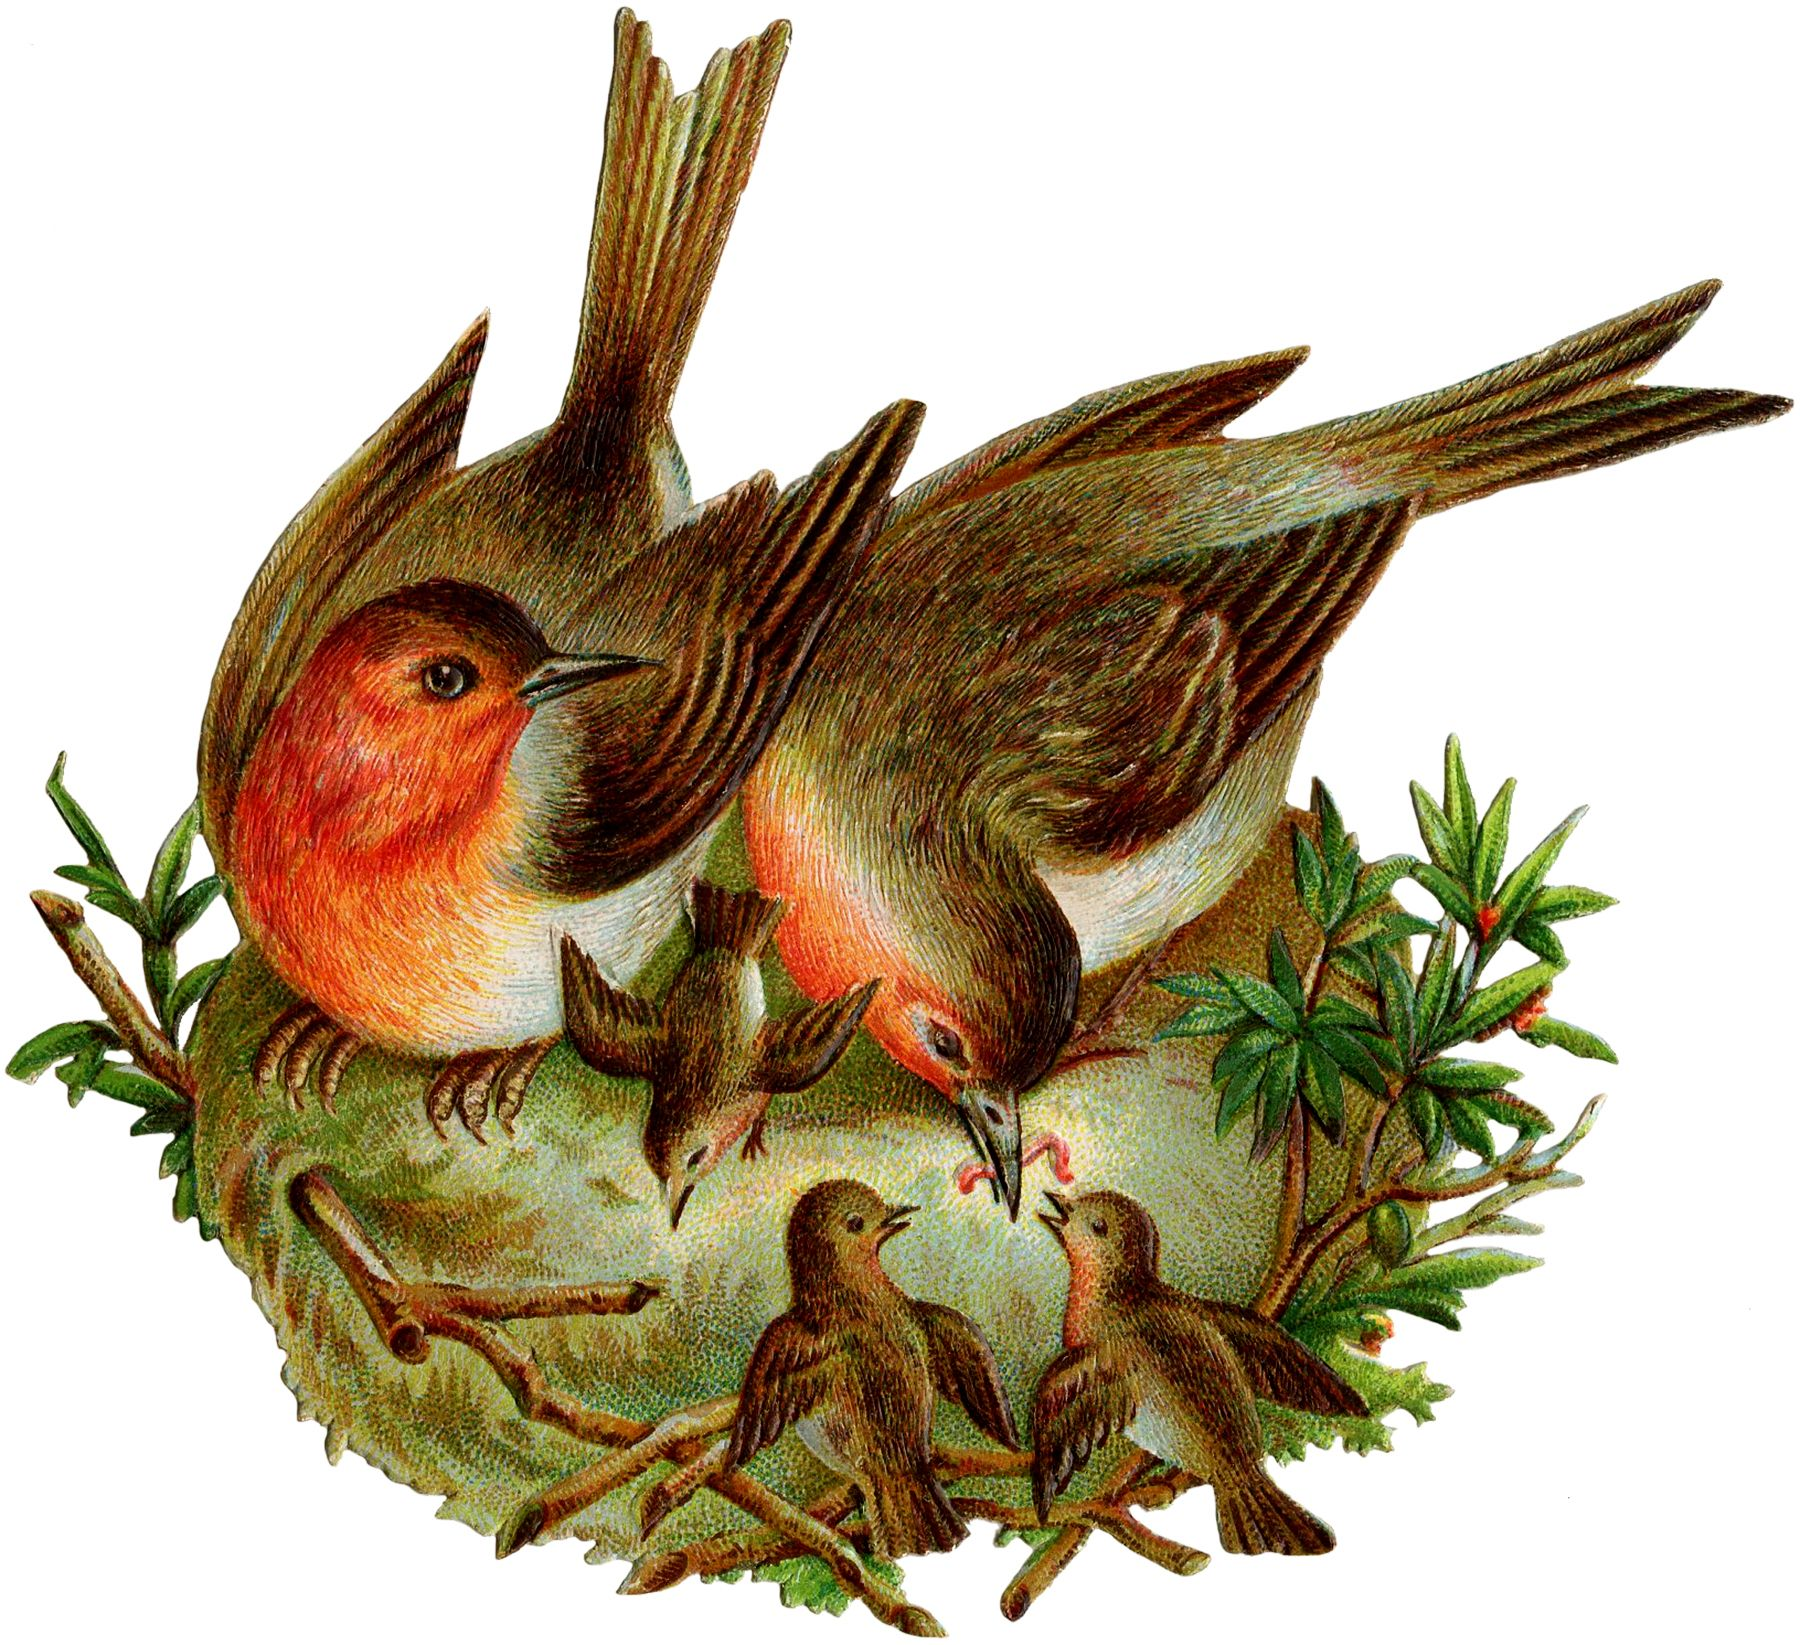 Vintage Robins Image